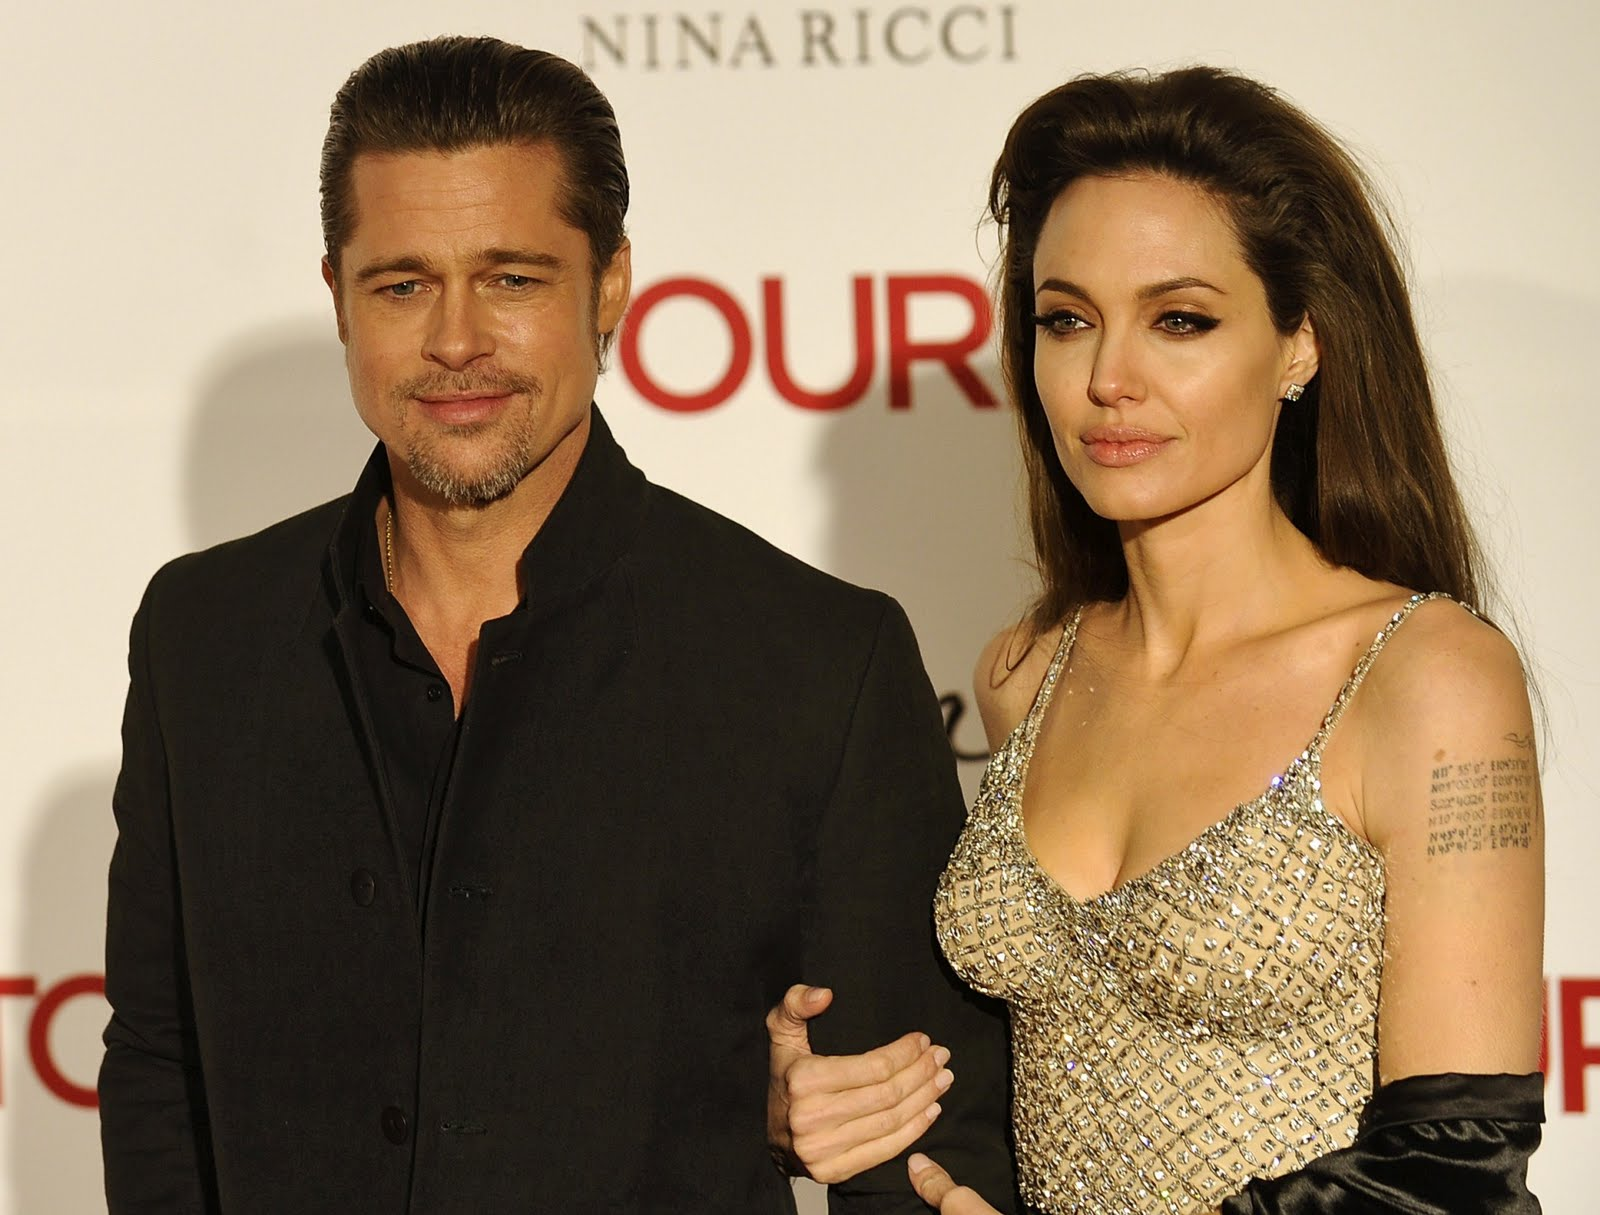 http://3.bp.blogspot.com/_ImioM_zH-NY/TRJRwbltNKI/AAAAAAAABIU/ehLouBu3sS8/s1600/Angelina-Jolie-110.jpg